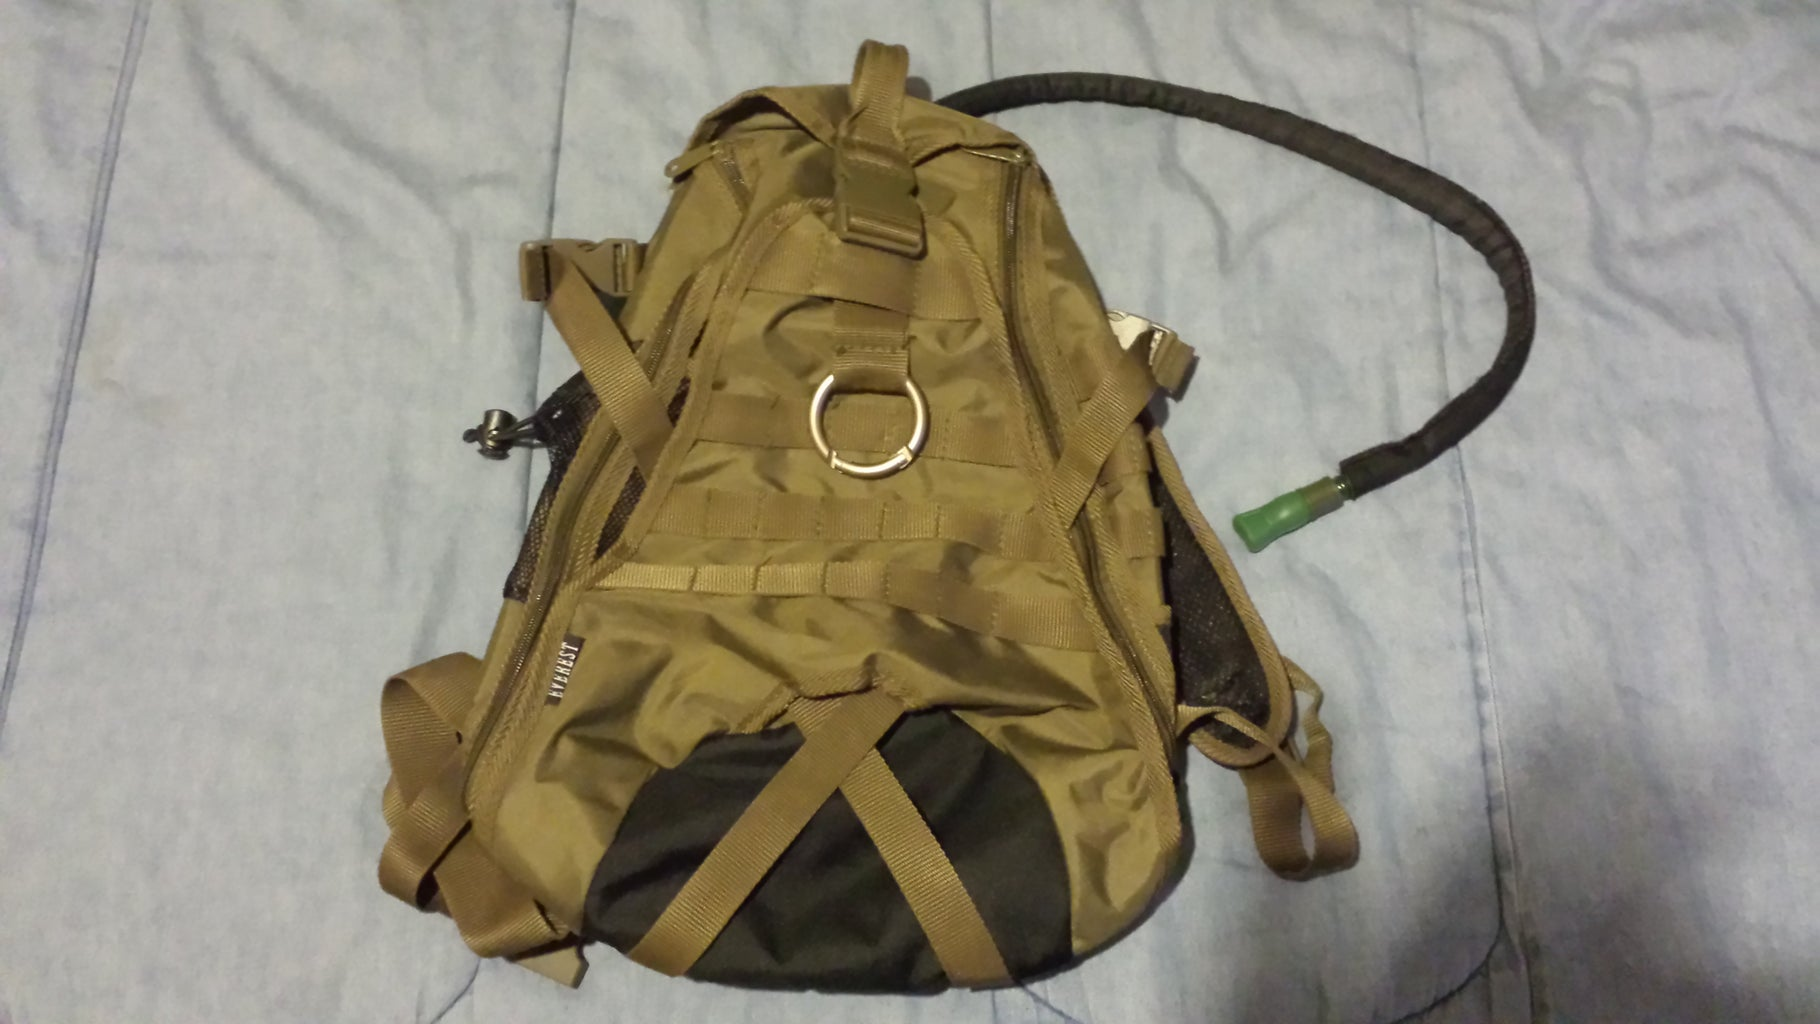 Choosing a Bag